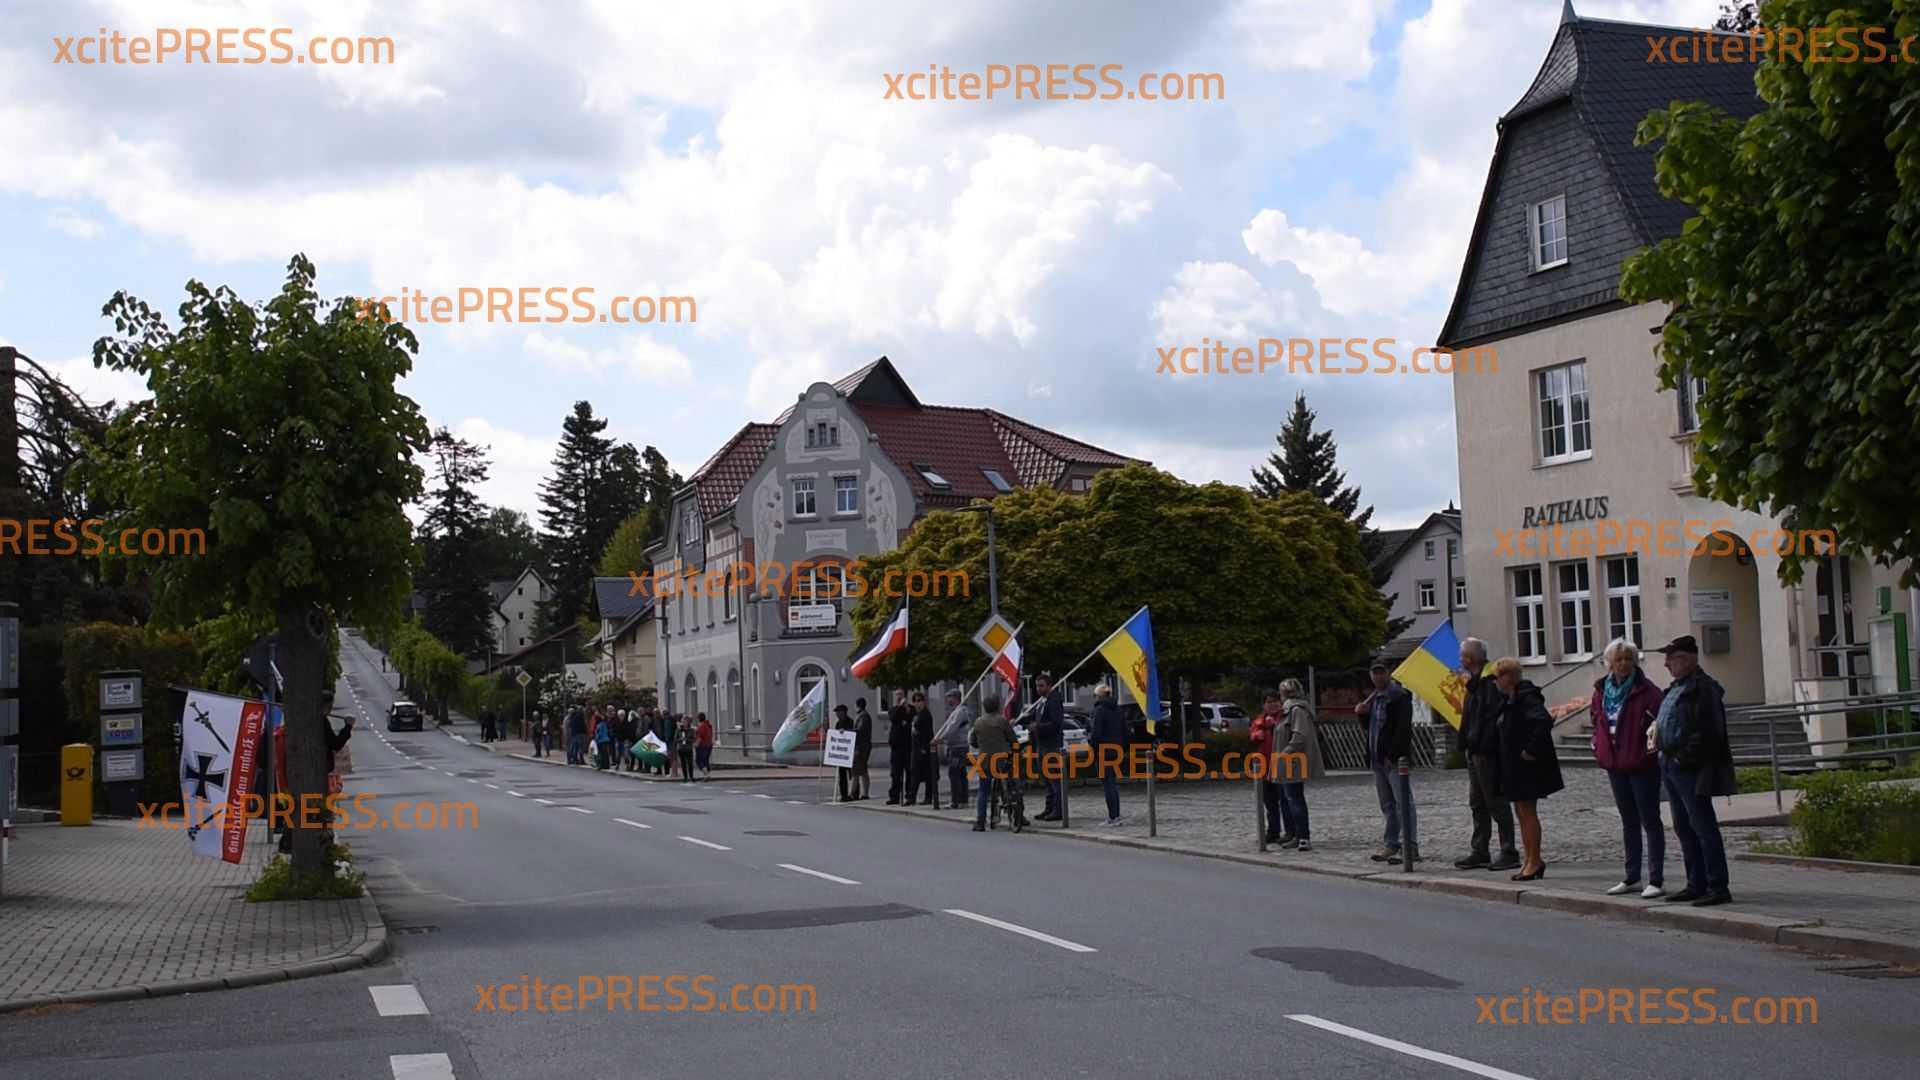 Wieder Corona-Protest an B96: Auch Reichskriegsflaggen bei stiller Demonstration